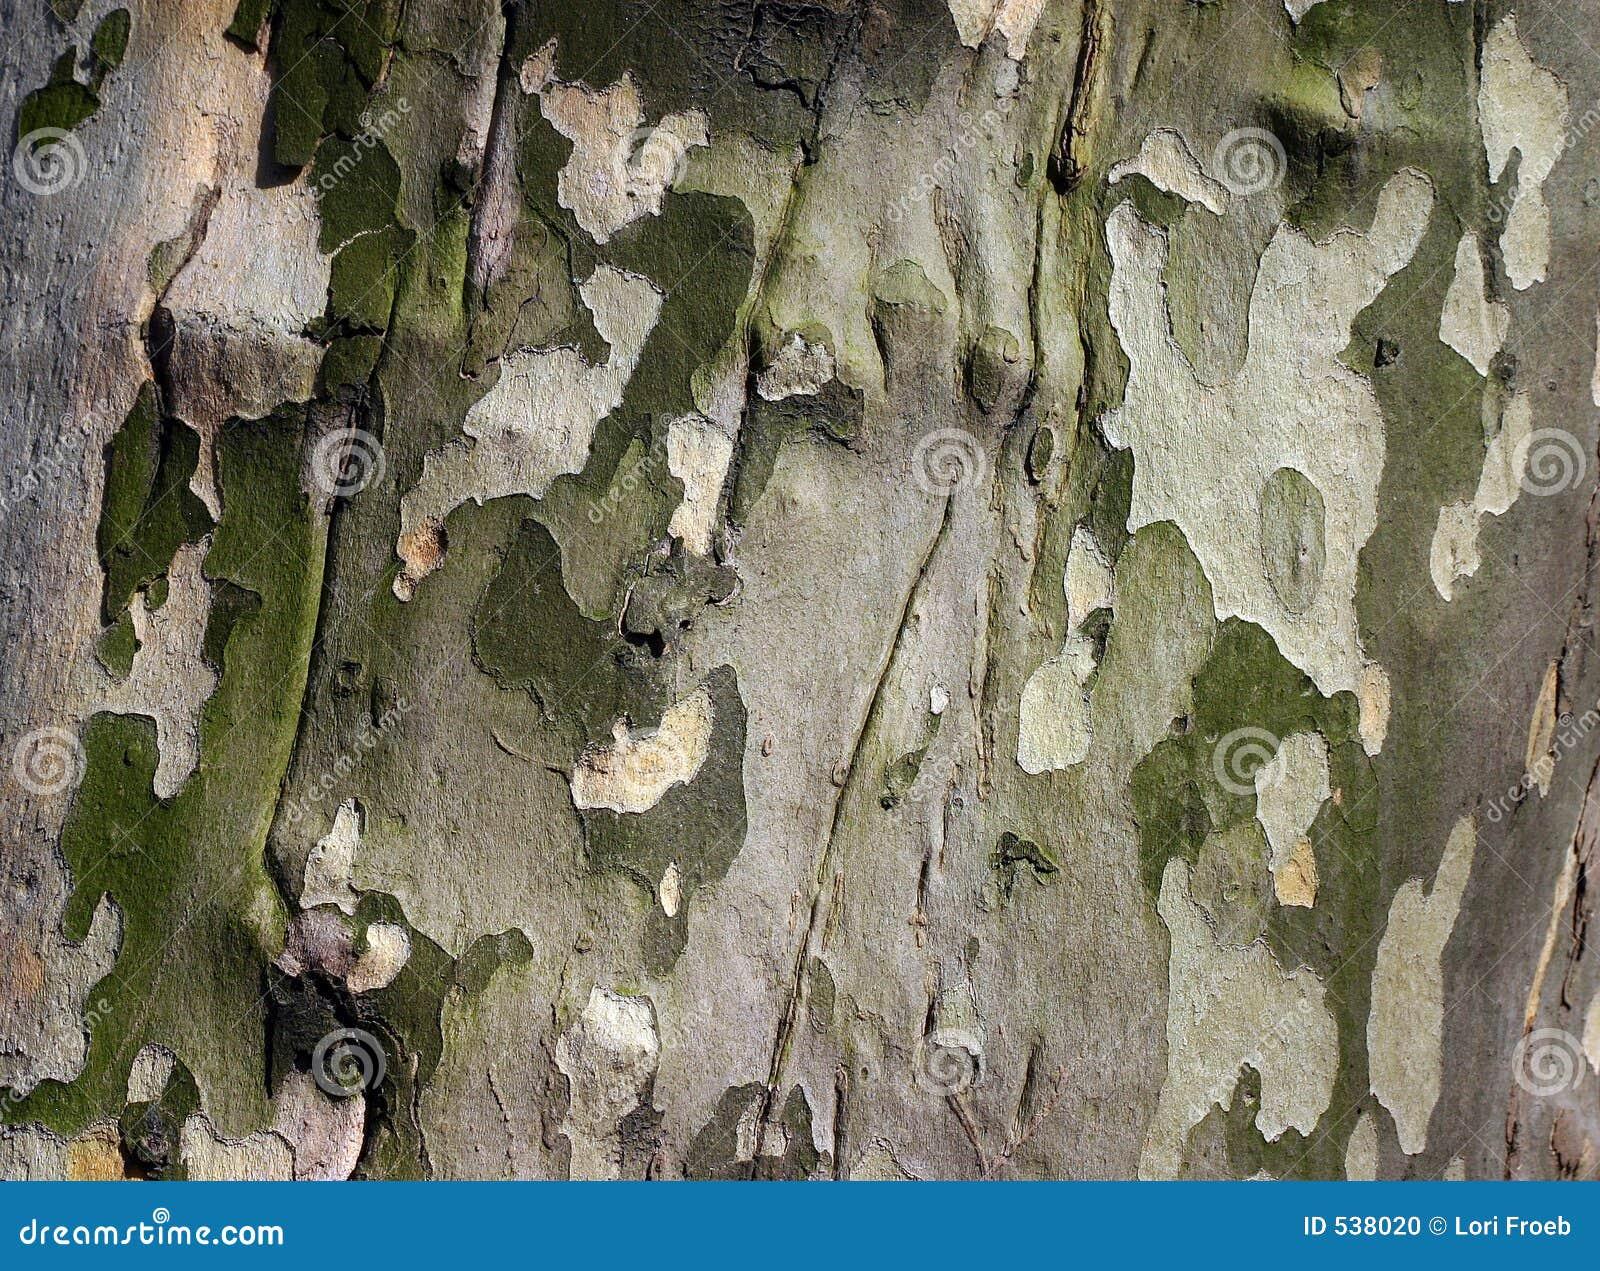 Download 吠声美国梧桐 库存照片. 图片 包括有 伪装, 树木繁茂, 树干, 详细资料, 美国梧桐, 工厂, 木头, 呈杂色 - 538020